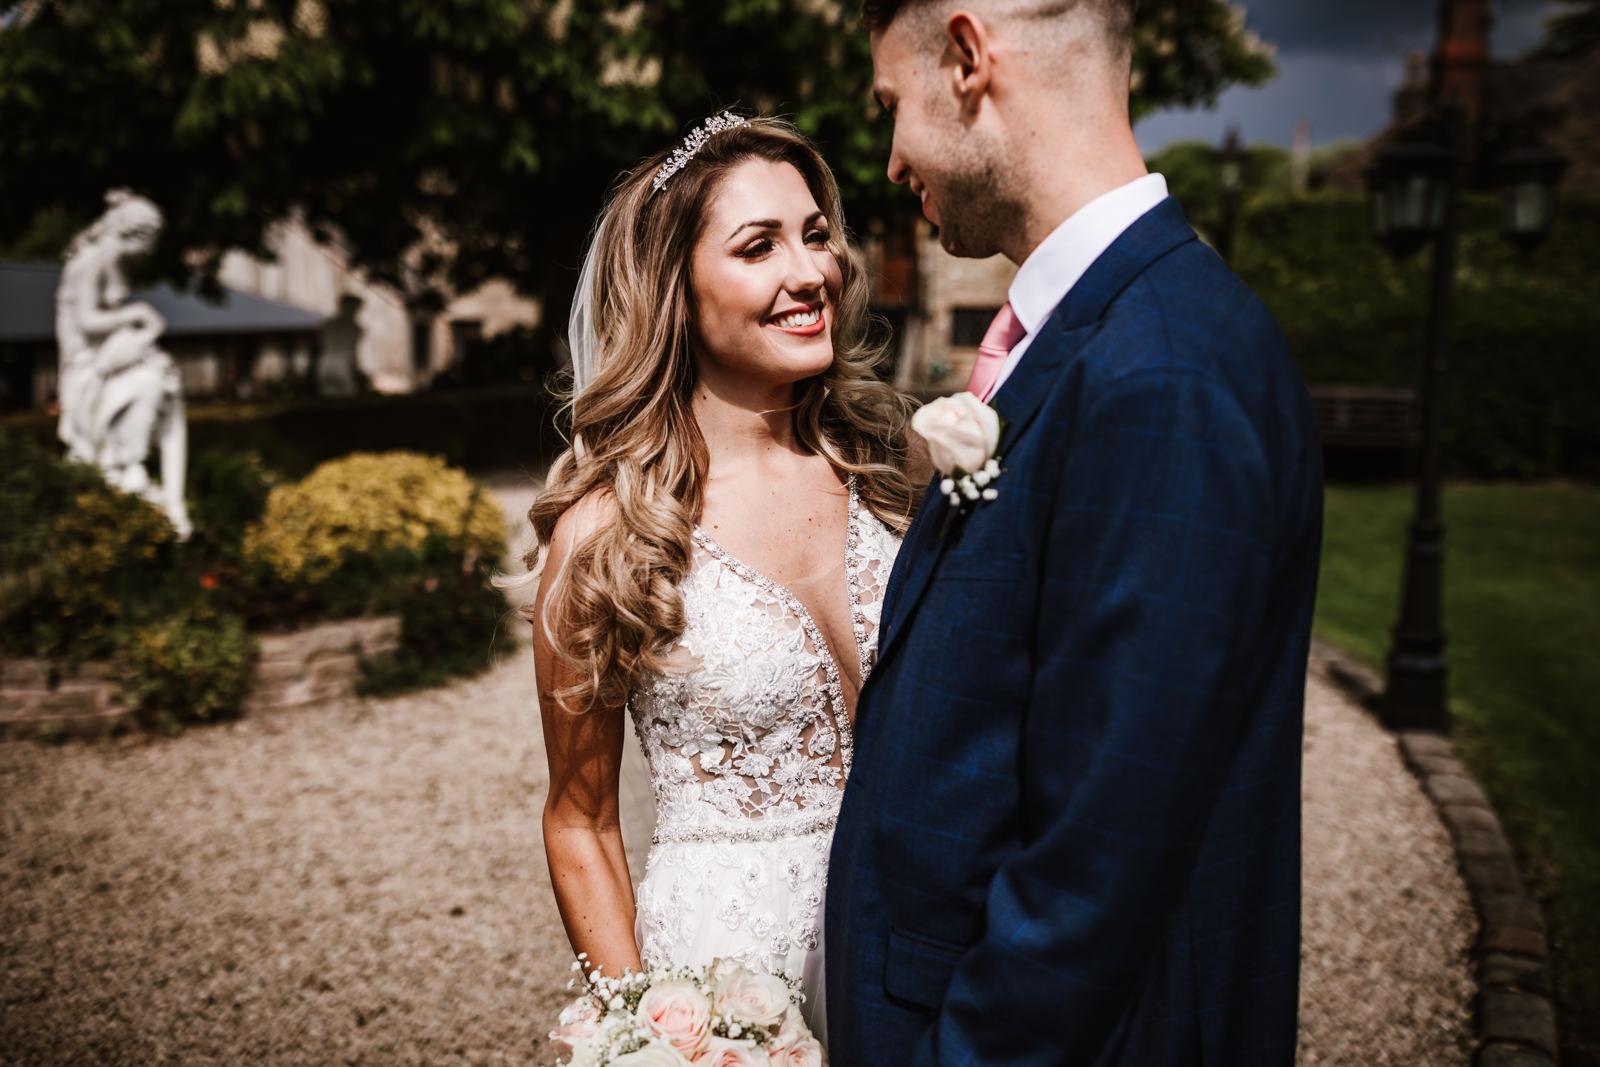 Happy bride sming at her groom